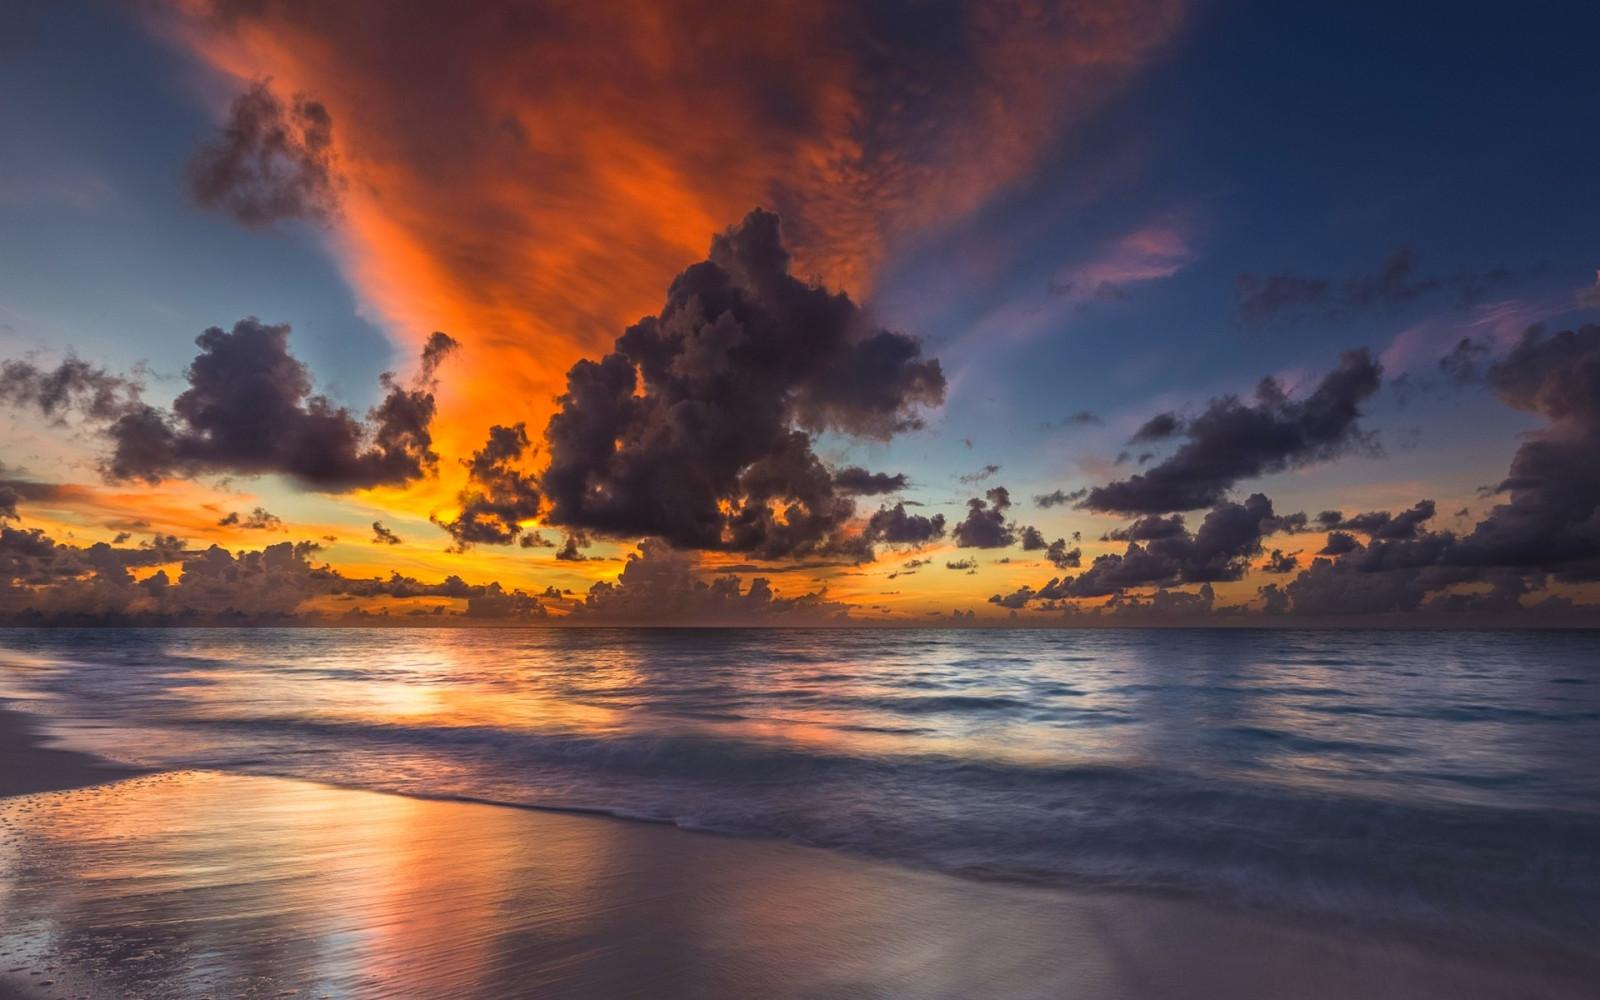 антисептик каждый постер рассвет океан один